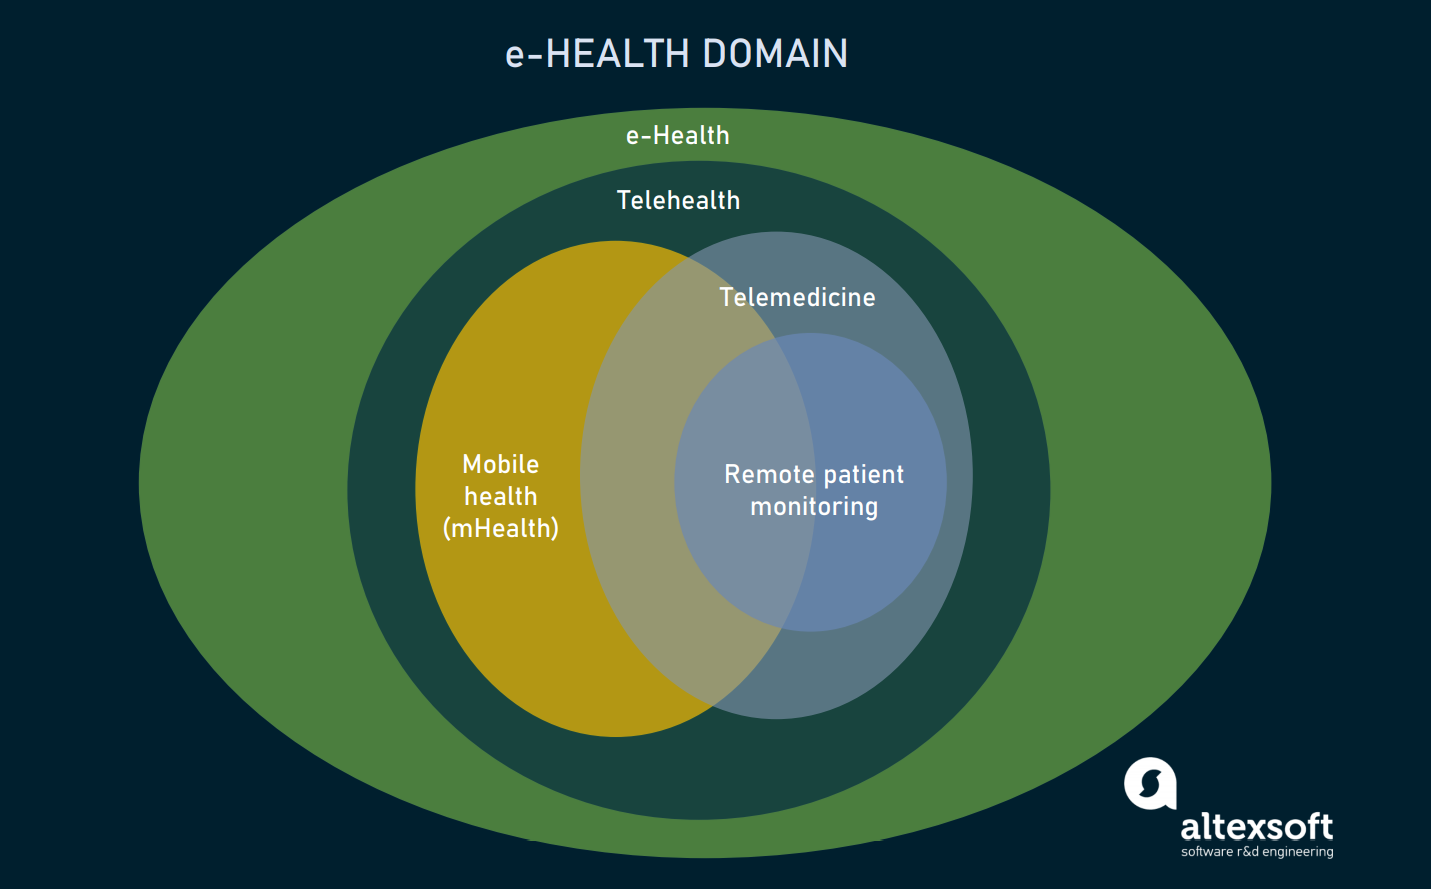 e-Health domain